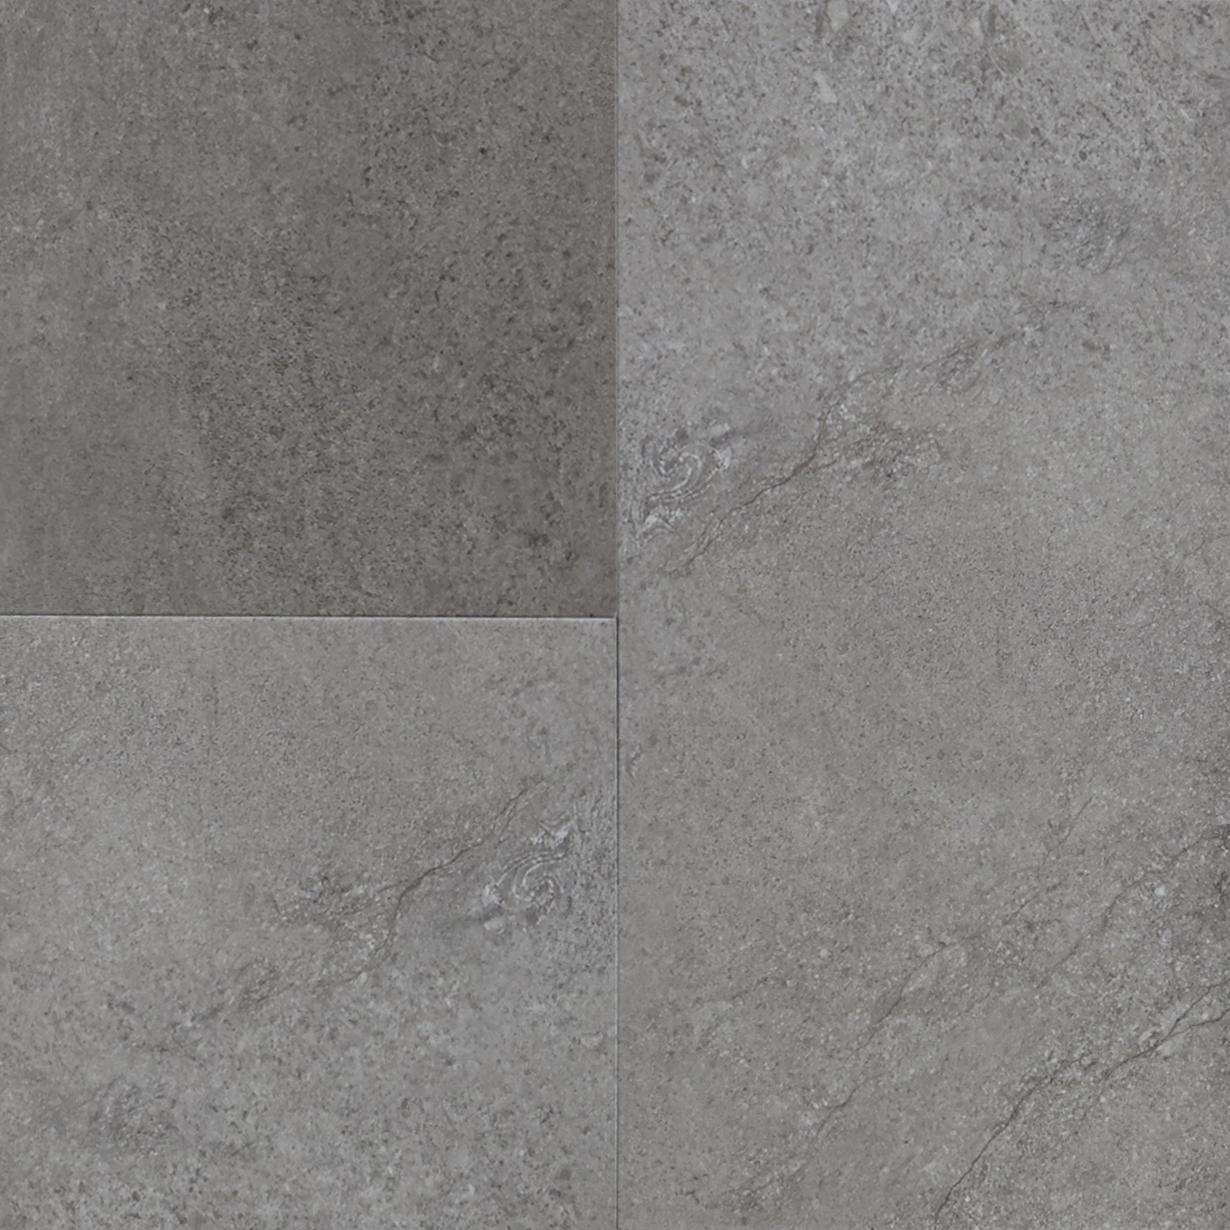 Mannington adura max carbon mar023 12 x 24 schillings mannington adura max luxury vinyl plank carbon mar023 12 dailygadgetfo Image collections